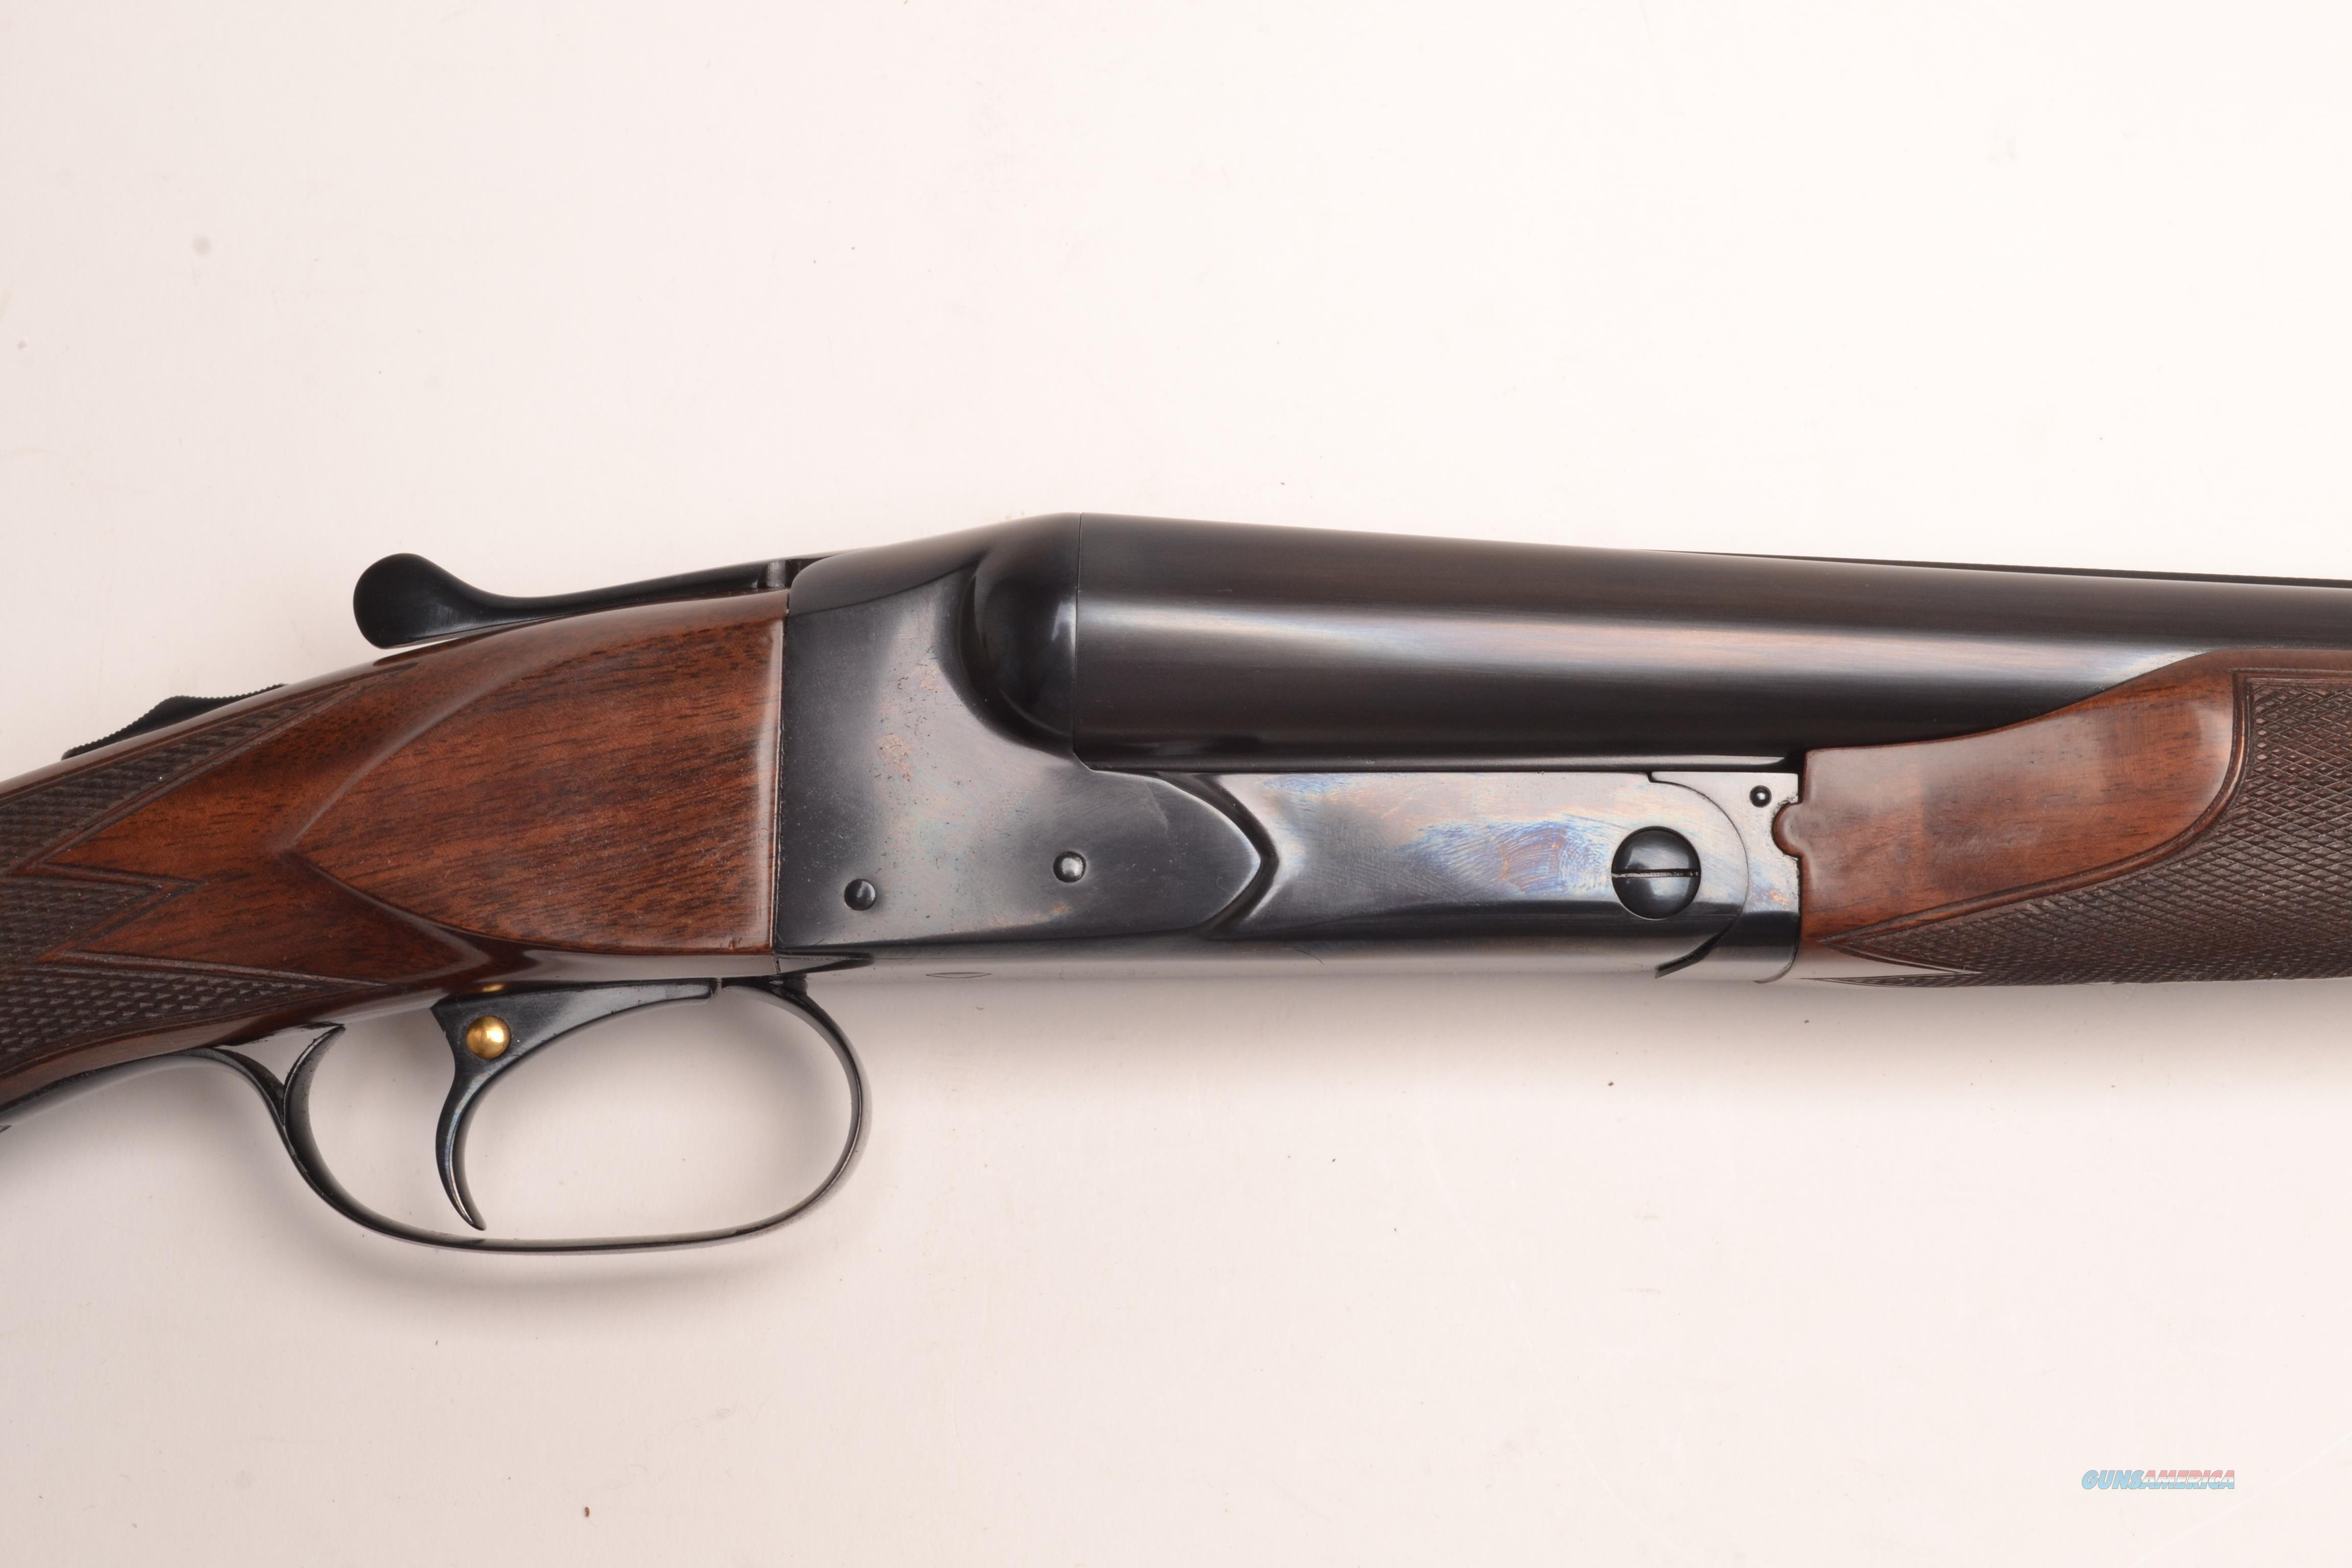 Winchester - Model 21, Heavy Weight, 12ga.  Guns > Shotguns > Winchester Shotguns - Modern > SxS